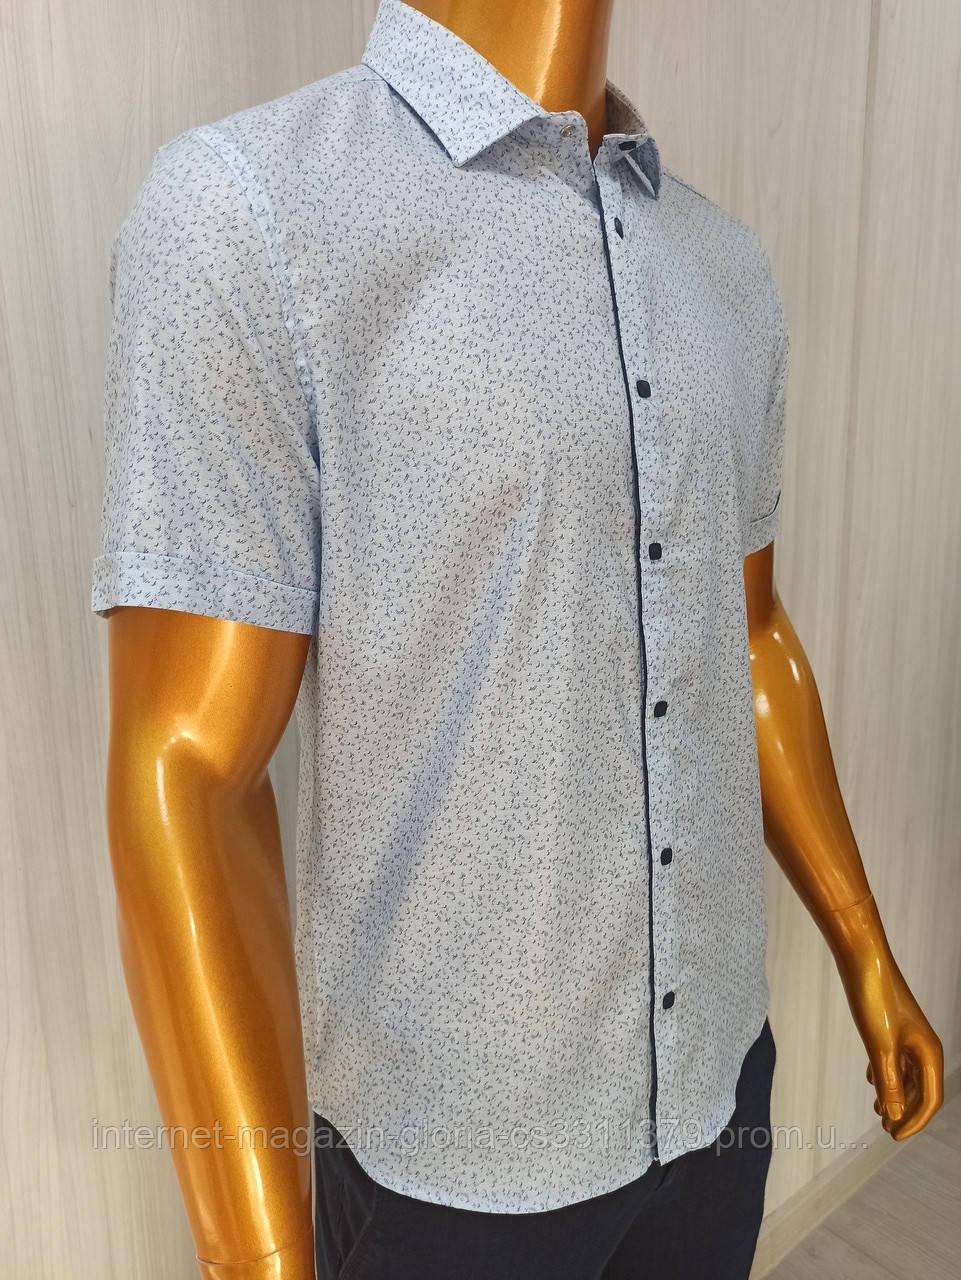 Мужская рубашка Amato. AG.19723-2. Размеры:M,L,XL(2), XXL.